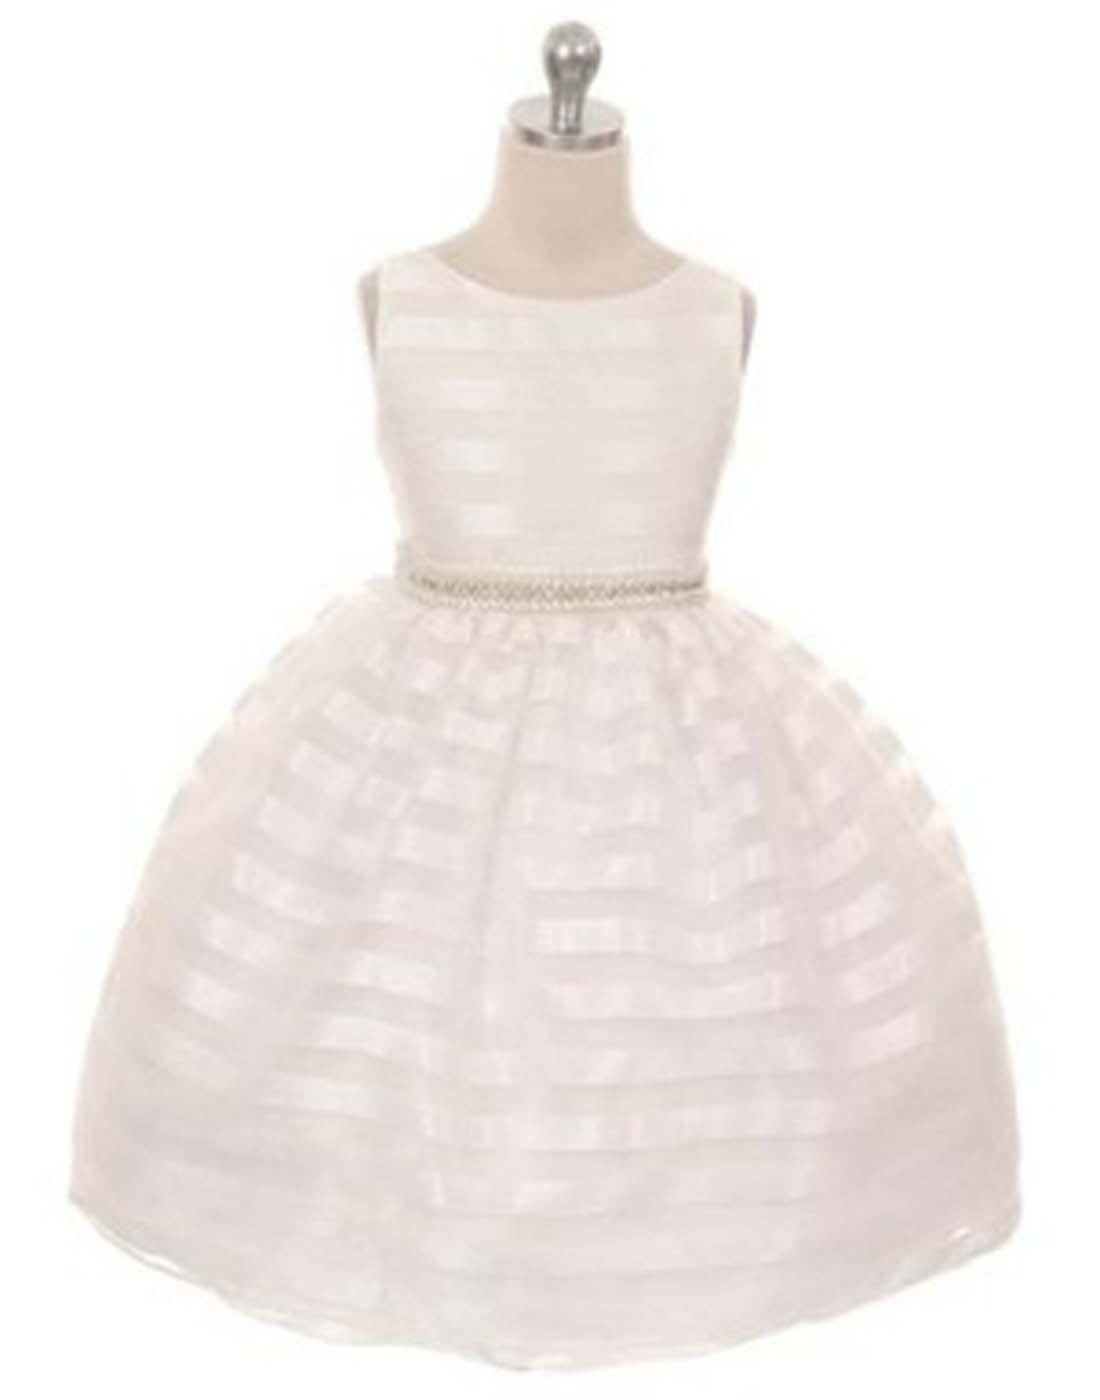 Organza striped overlay dress with gem belt ivory flower girl